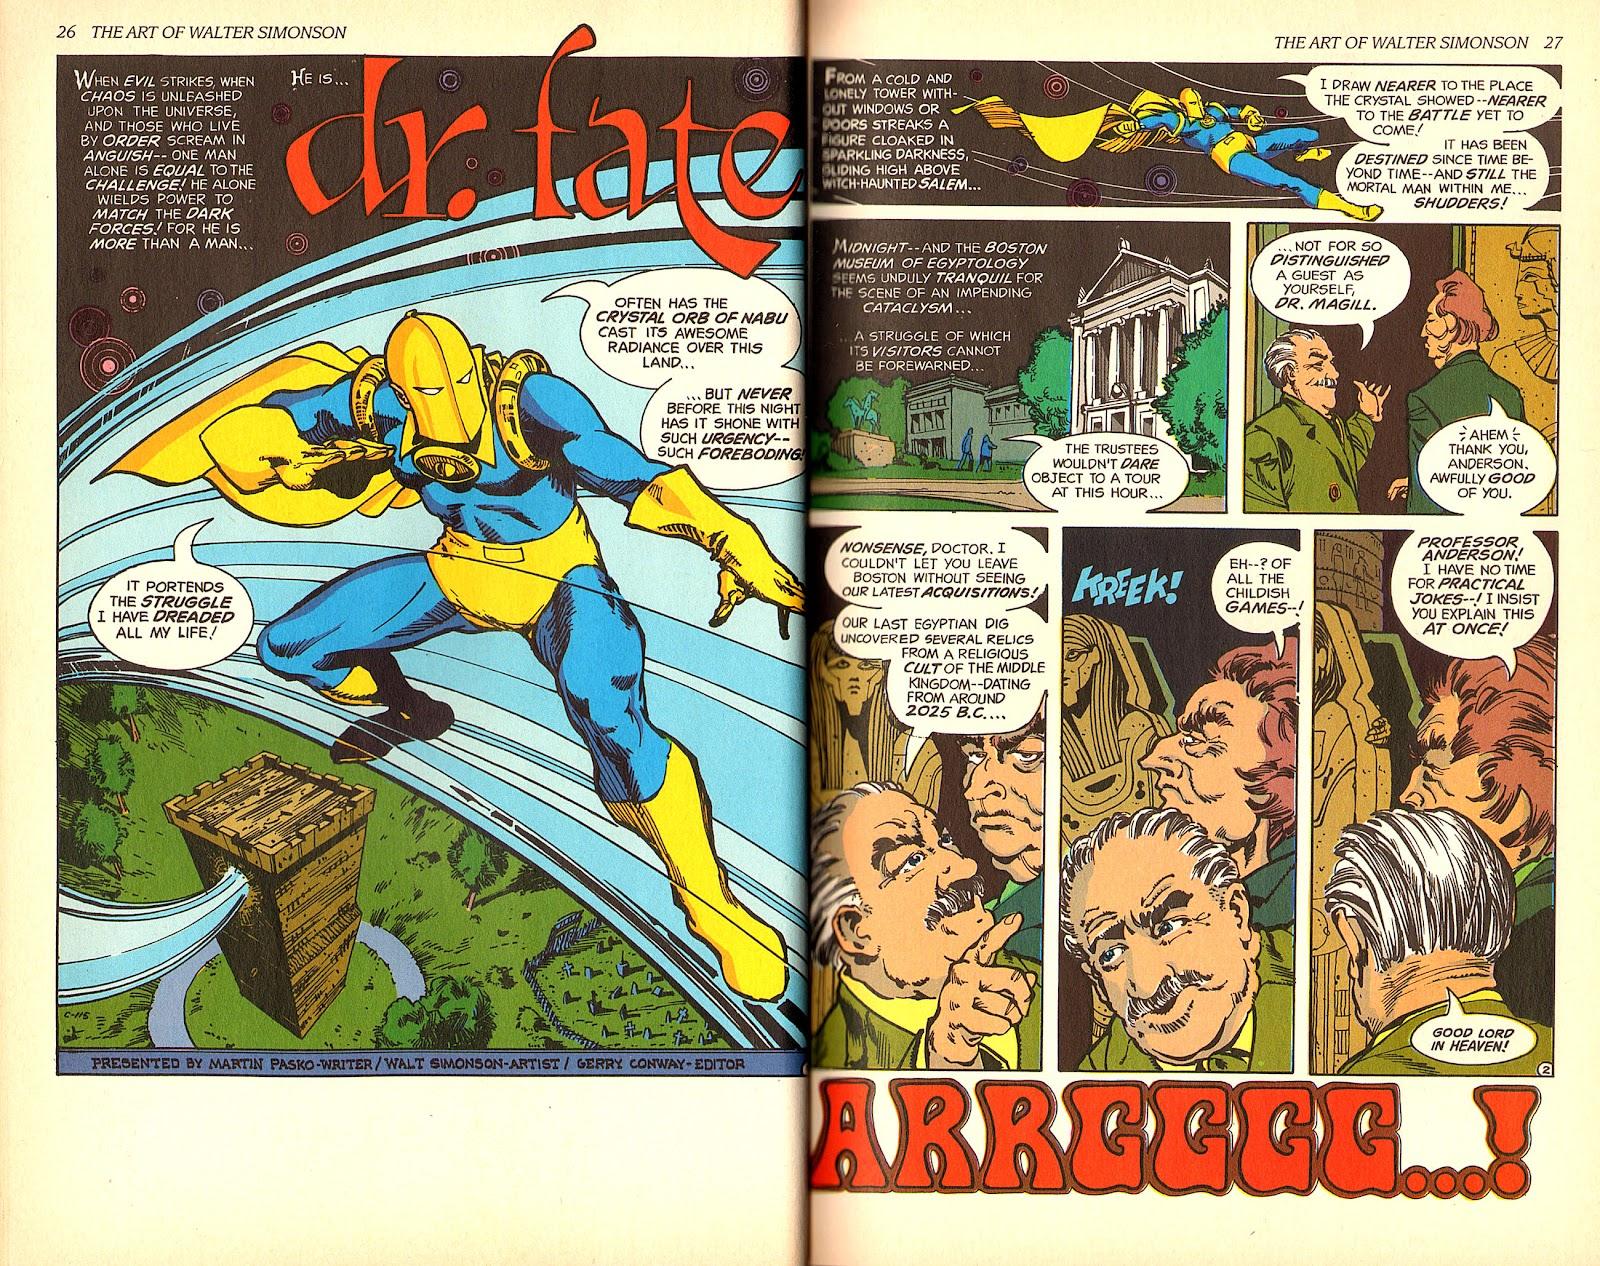 Read online The Art of Walter Simonson comic -  Issue # TPB - 15